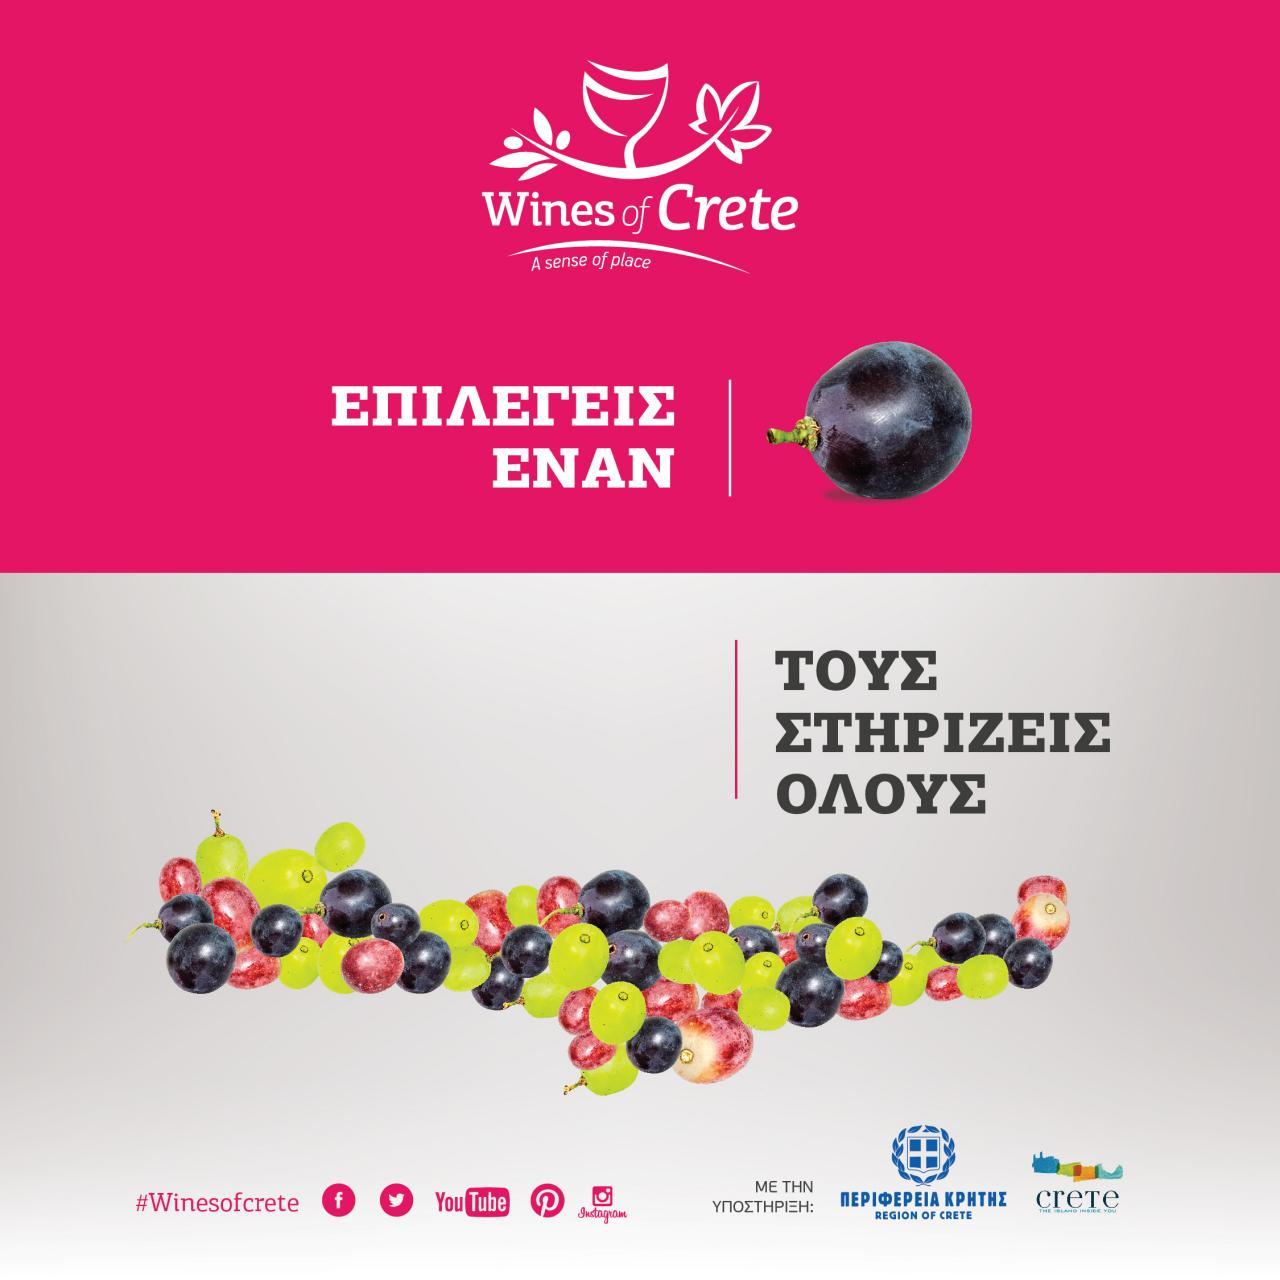 Wines of Crete: Στηρίζεις έναν, τους στηρίζεις όλους!